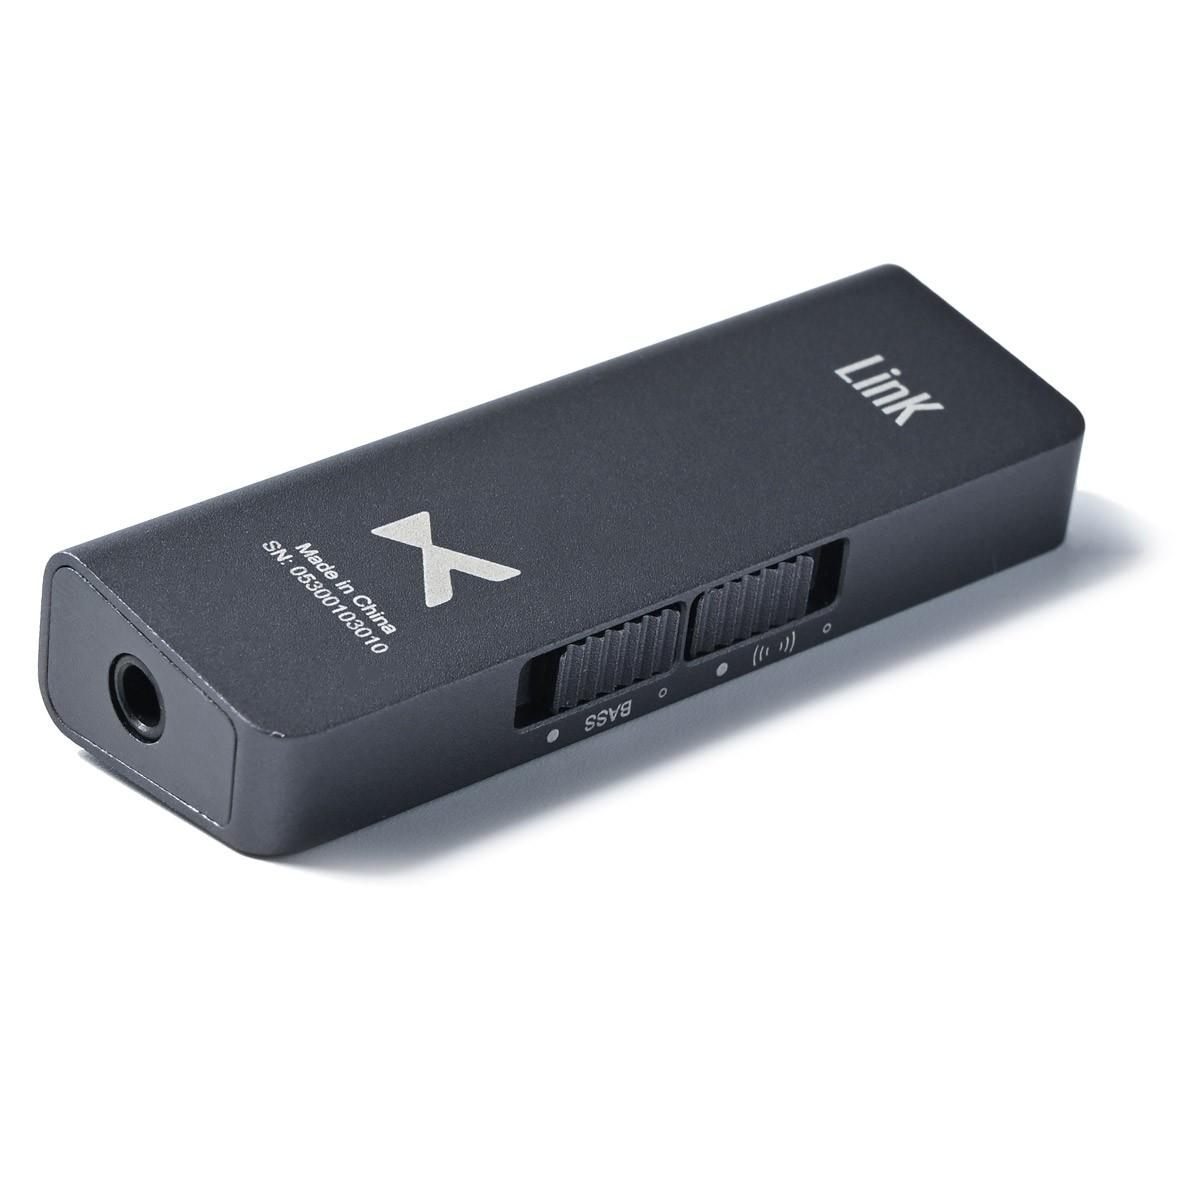 XDUOO LINK2 Adaptateur DAC USB-C ES9118EC 32bit 384kHz DSD256 150mW 32 Ohm Gris